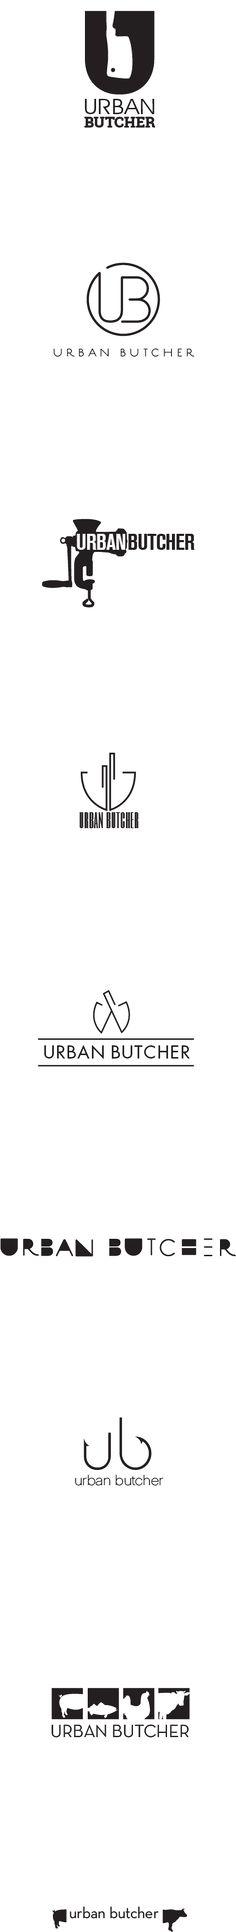 Urban Butcher logos on Behance